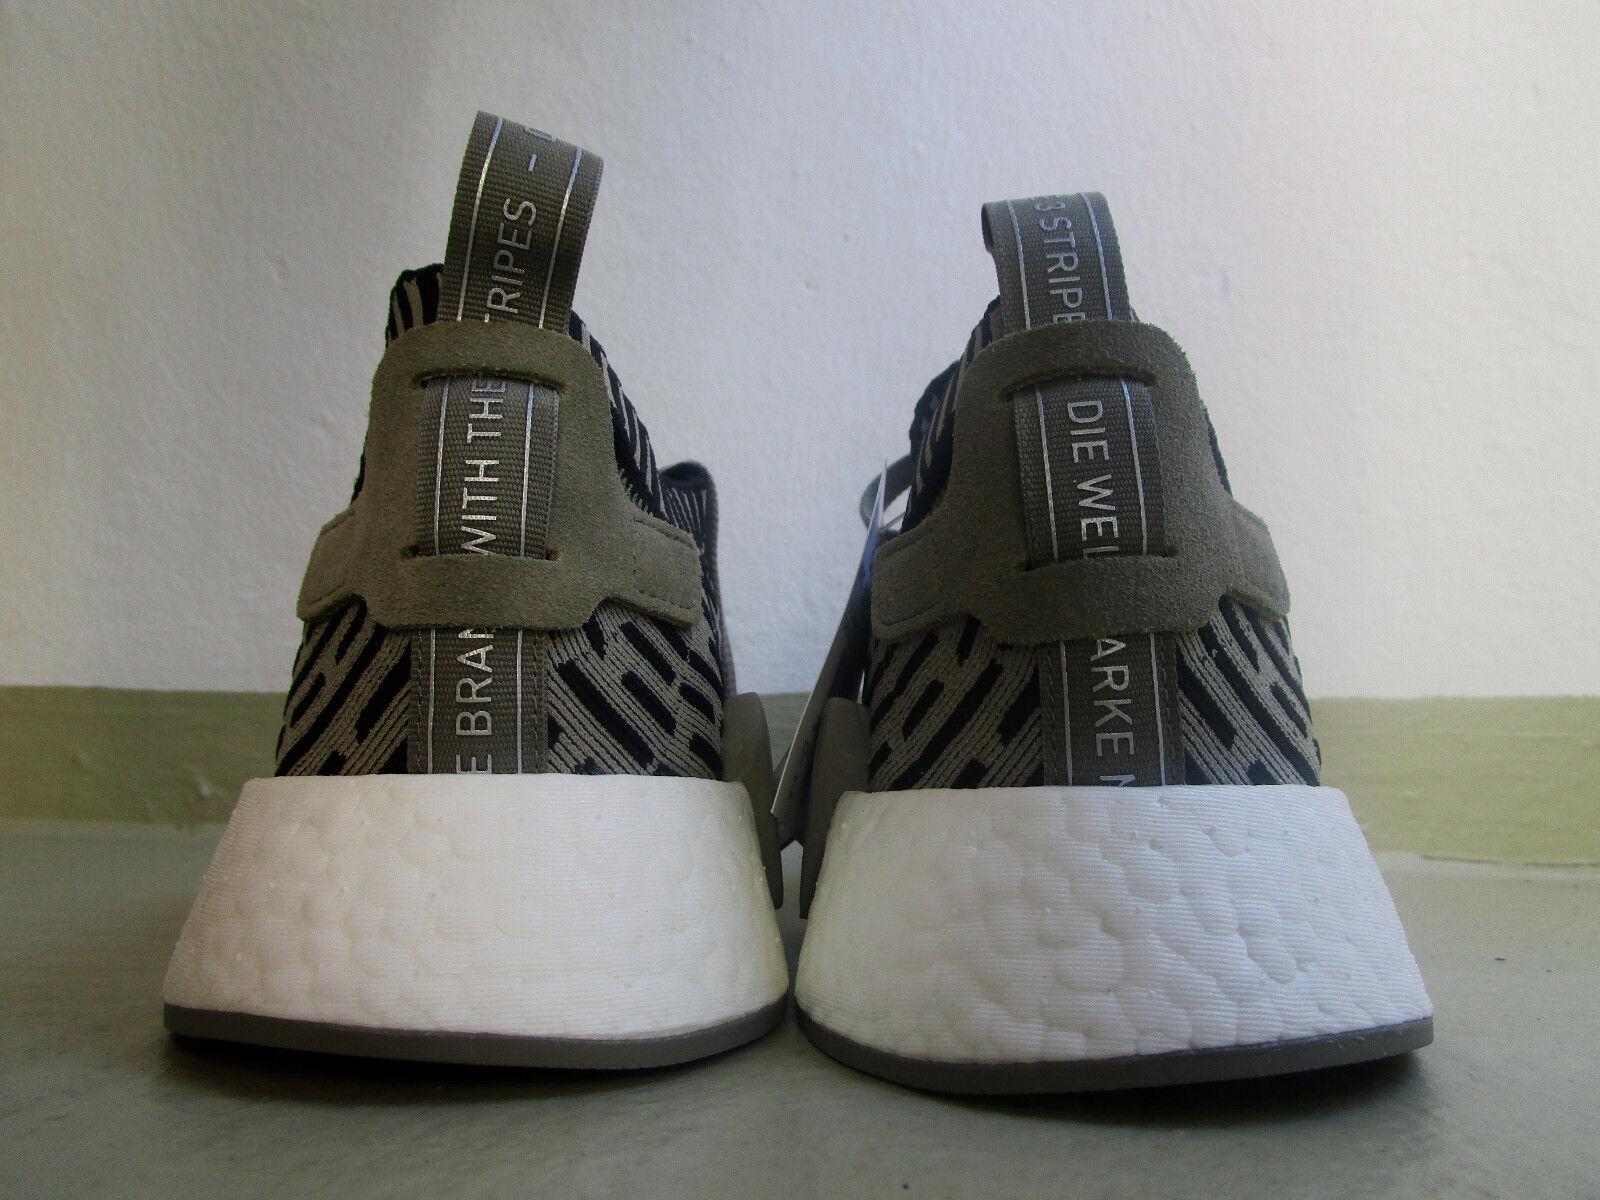 Adidas NMD r2 PK PK PK OG 45 1/3 Originals Olive/Blanc -Noir  fc0fe3